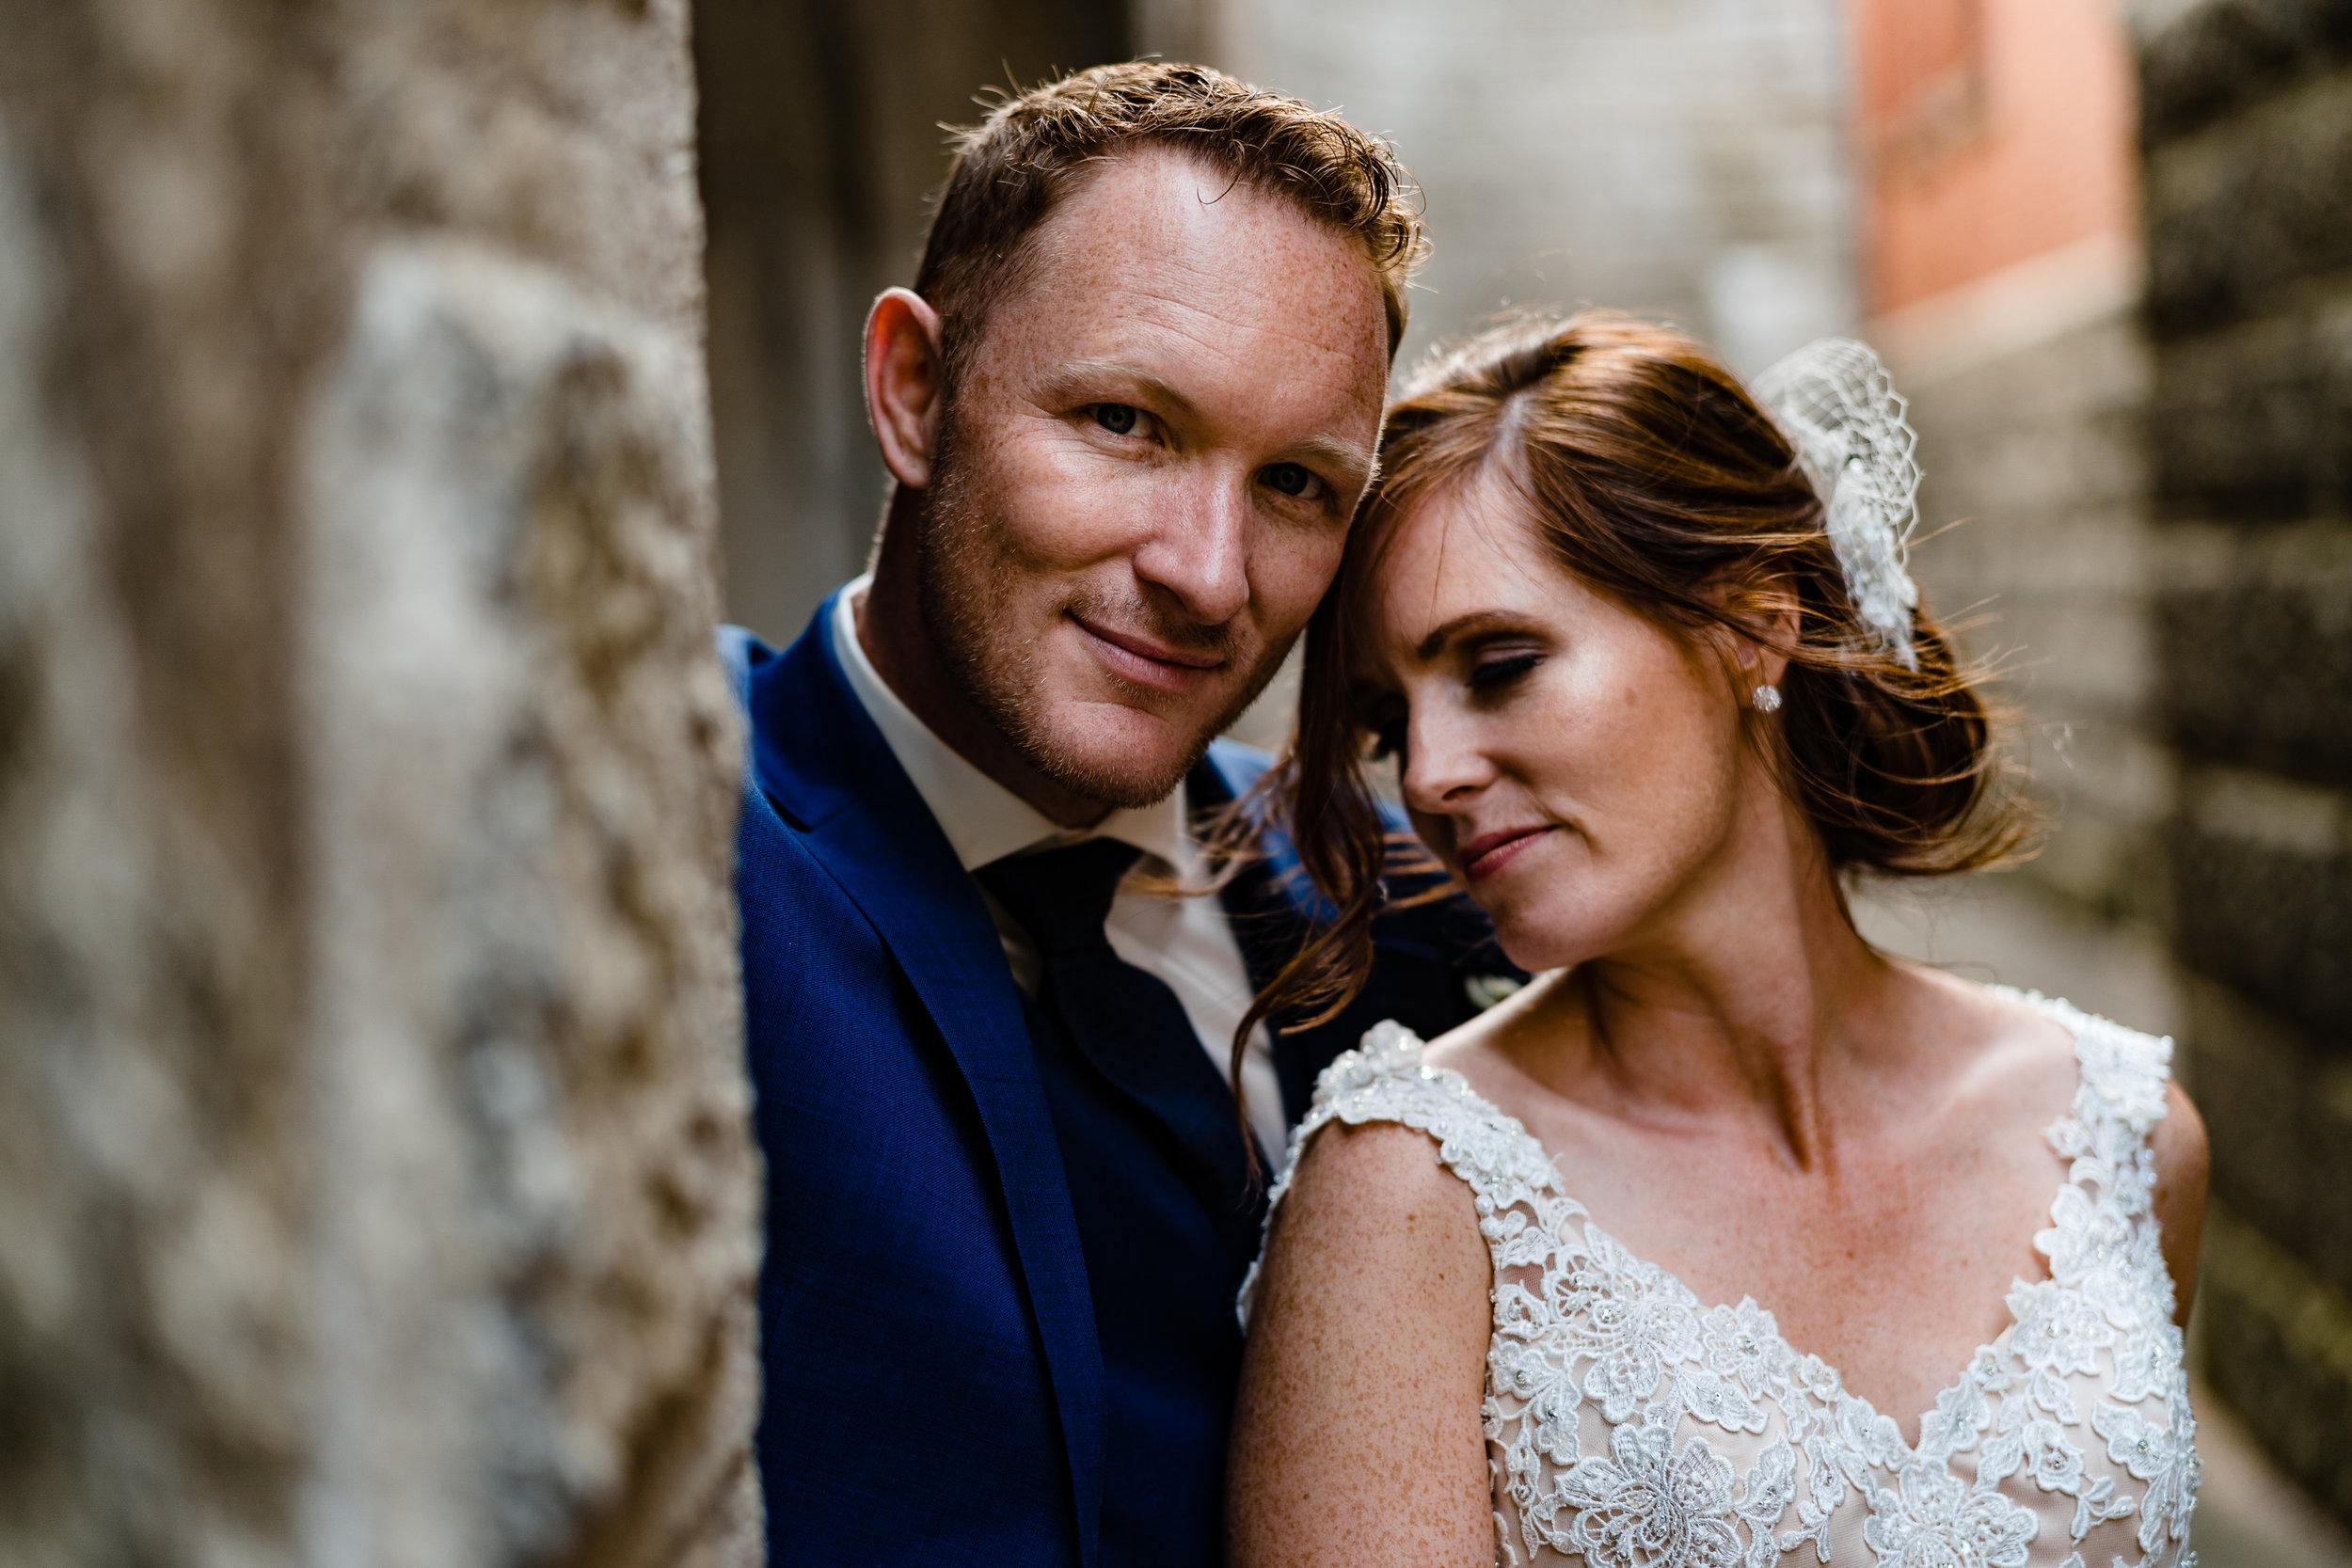 Jenna-Pat-428halifax-novascotia-weddingphotography-wedding-foxandfellow.jpg